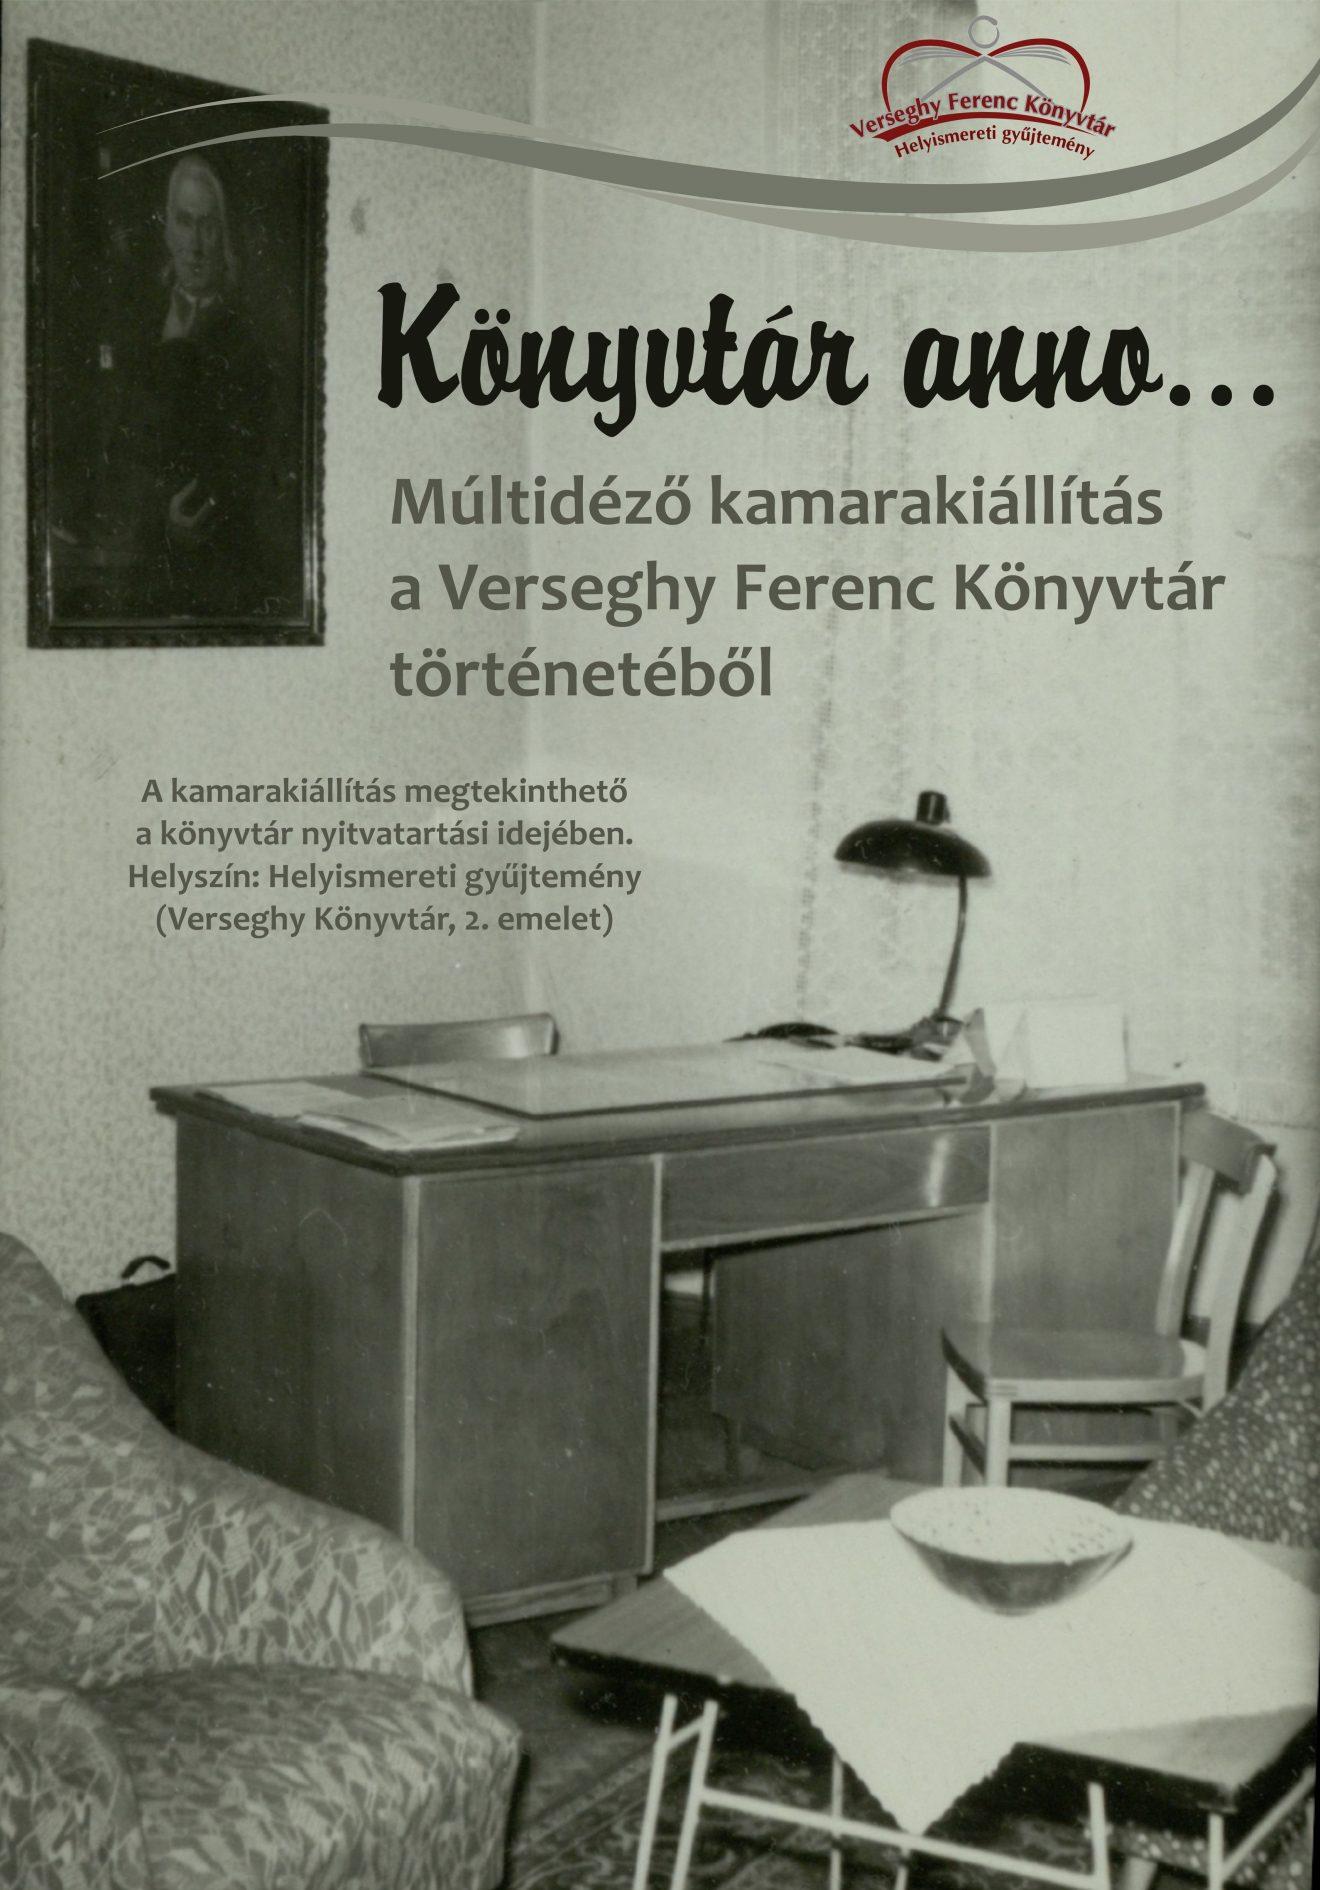 konyvtar_anno_2021